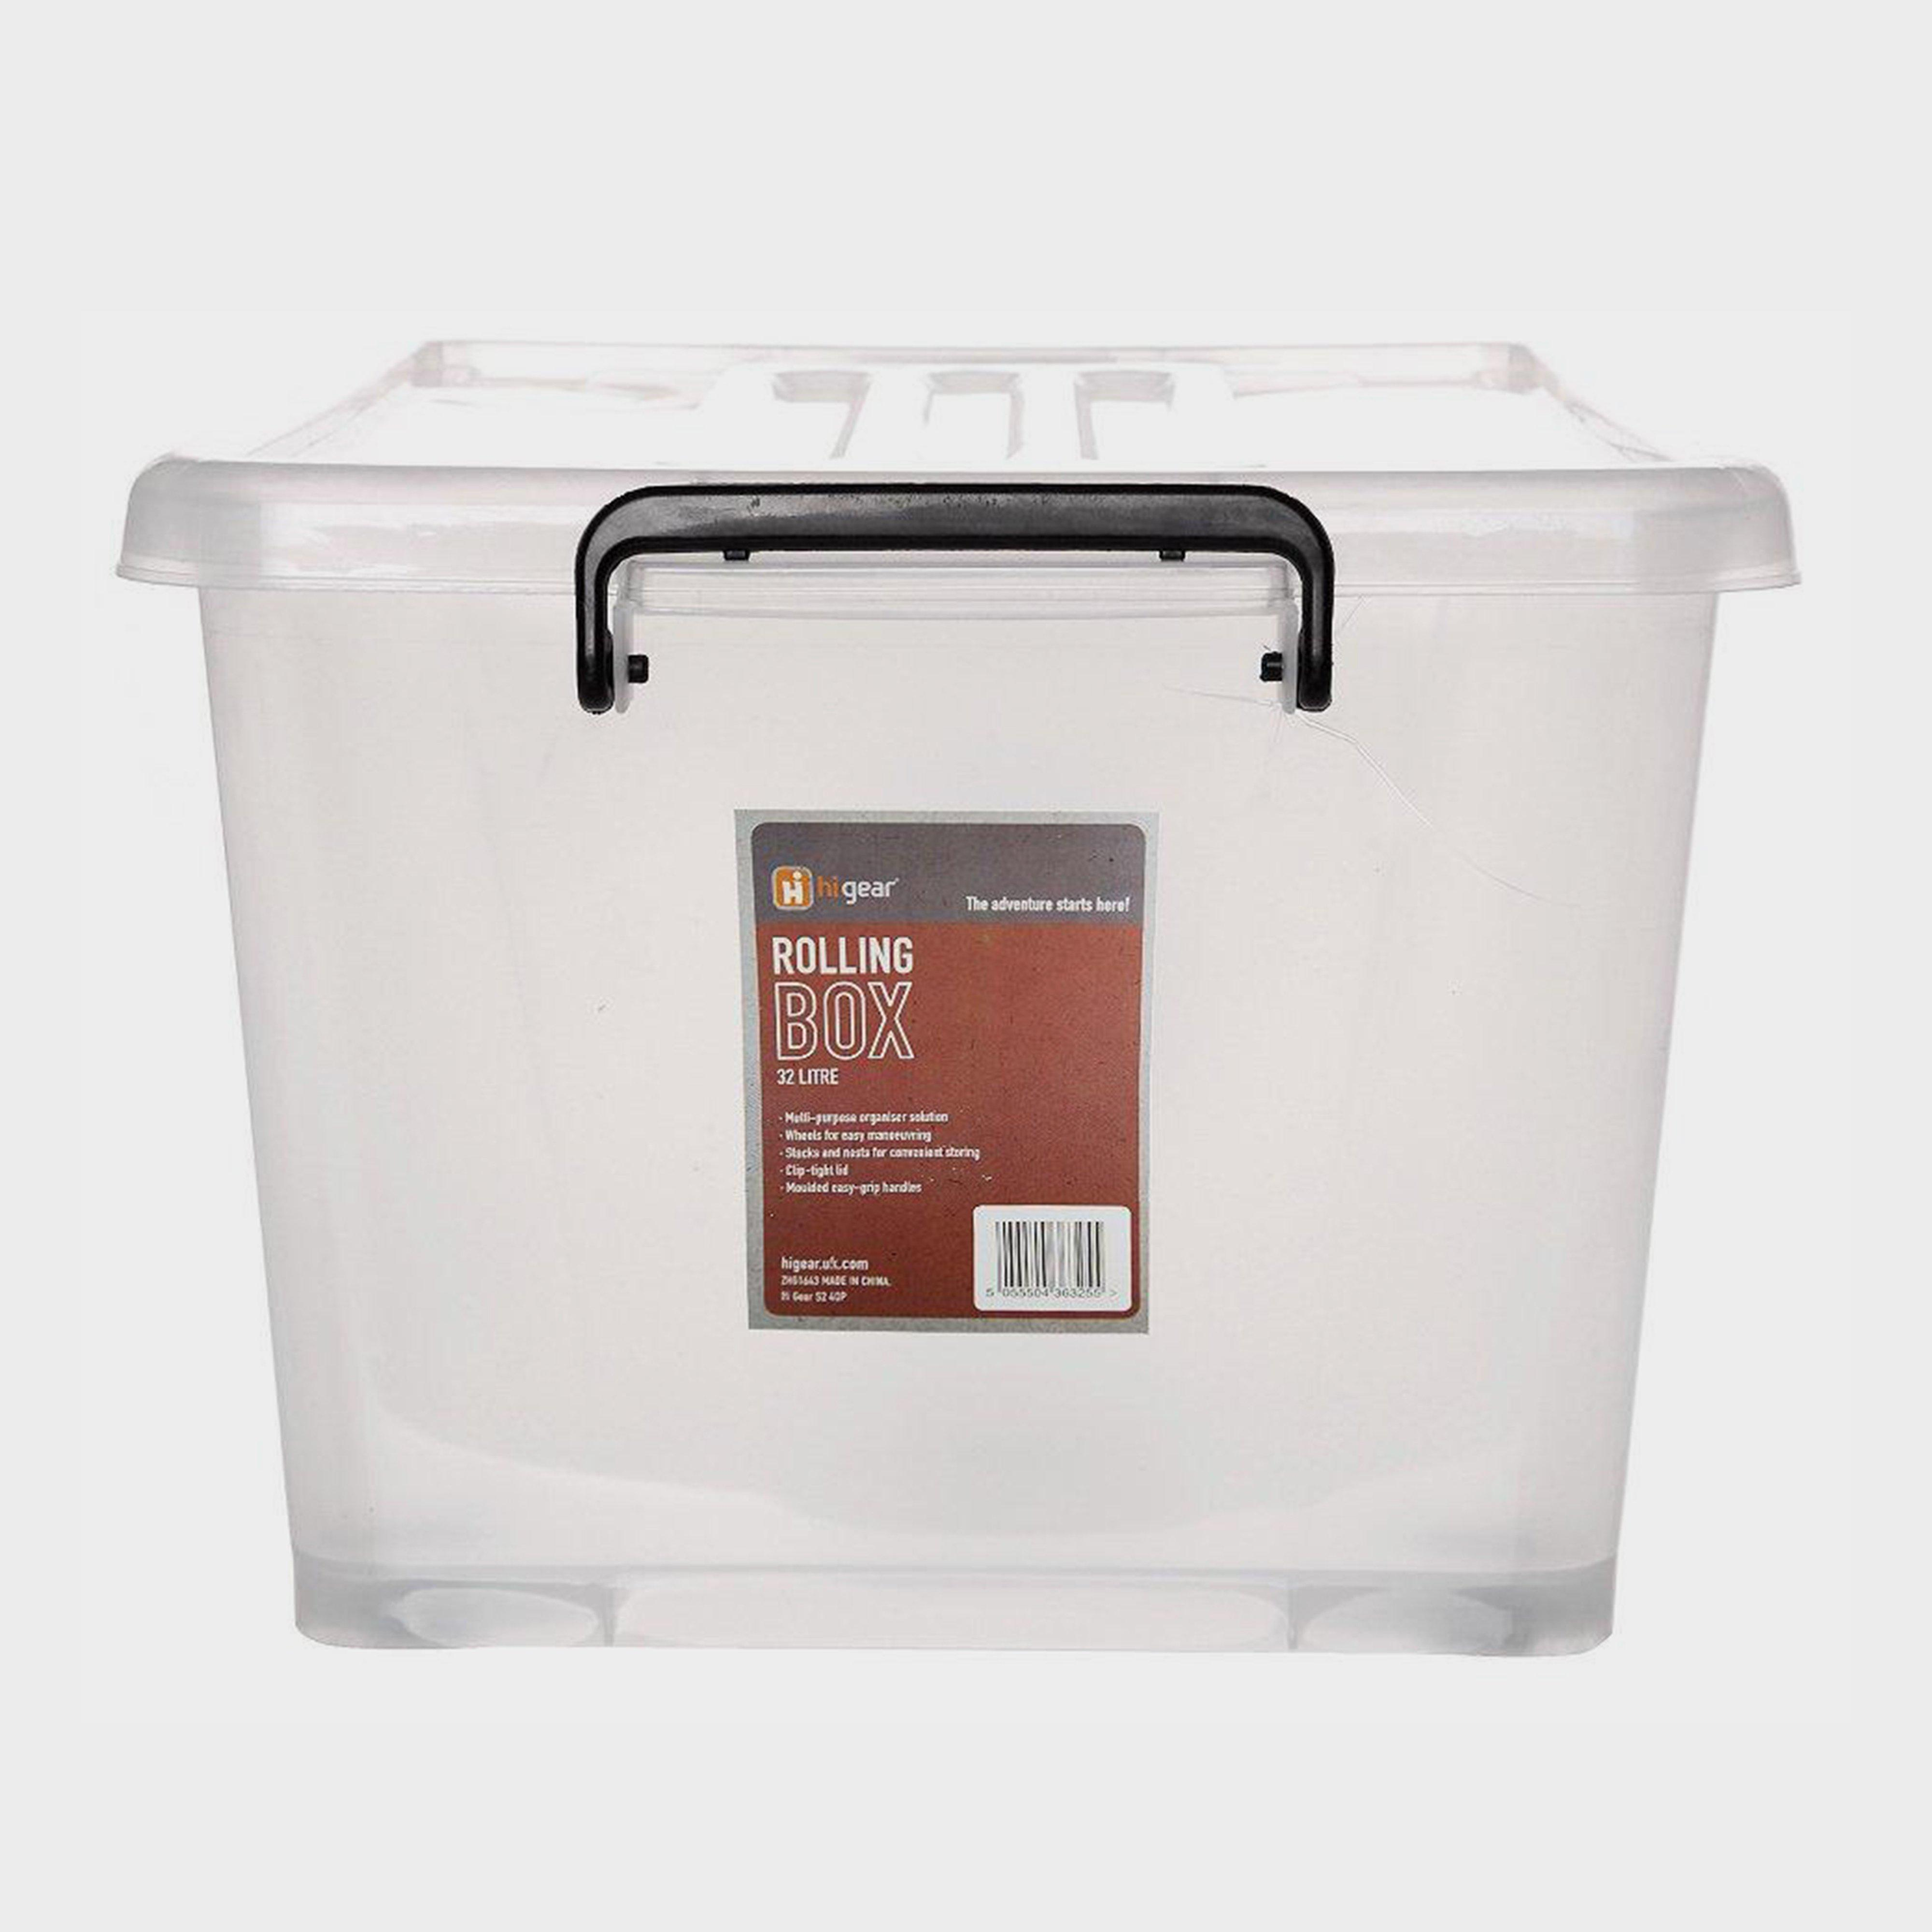 HI-GEAR Rolling Box (32 Litre), White/32L